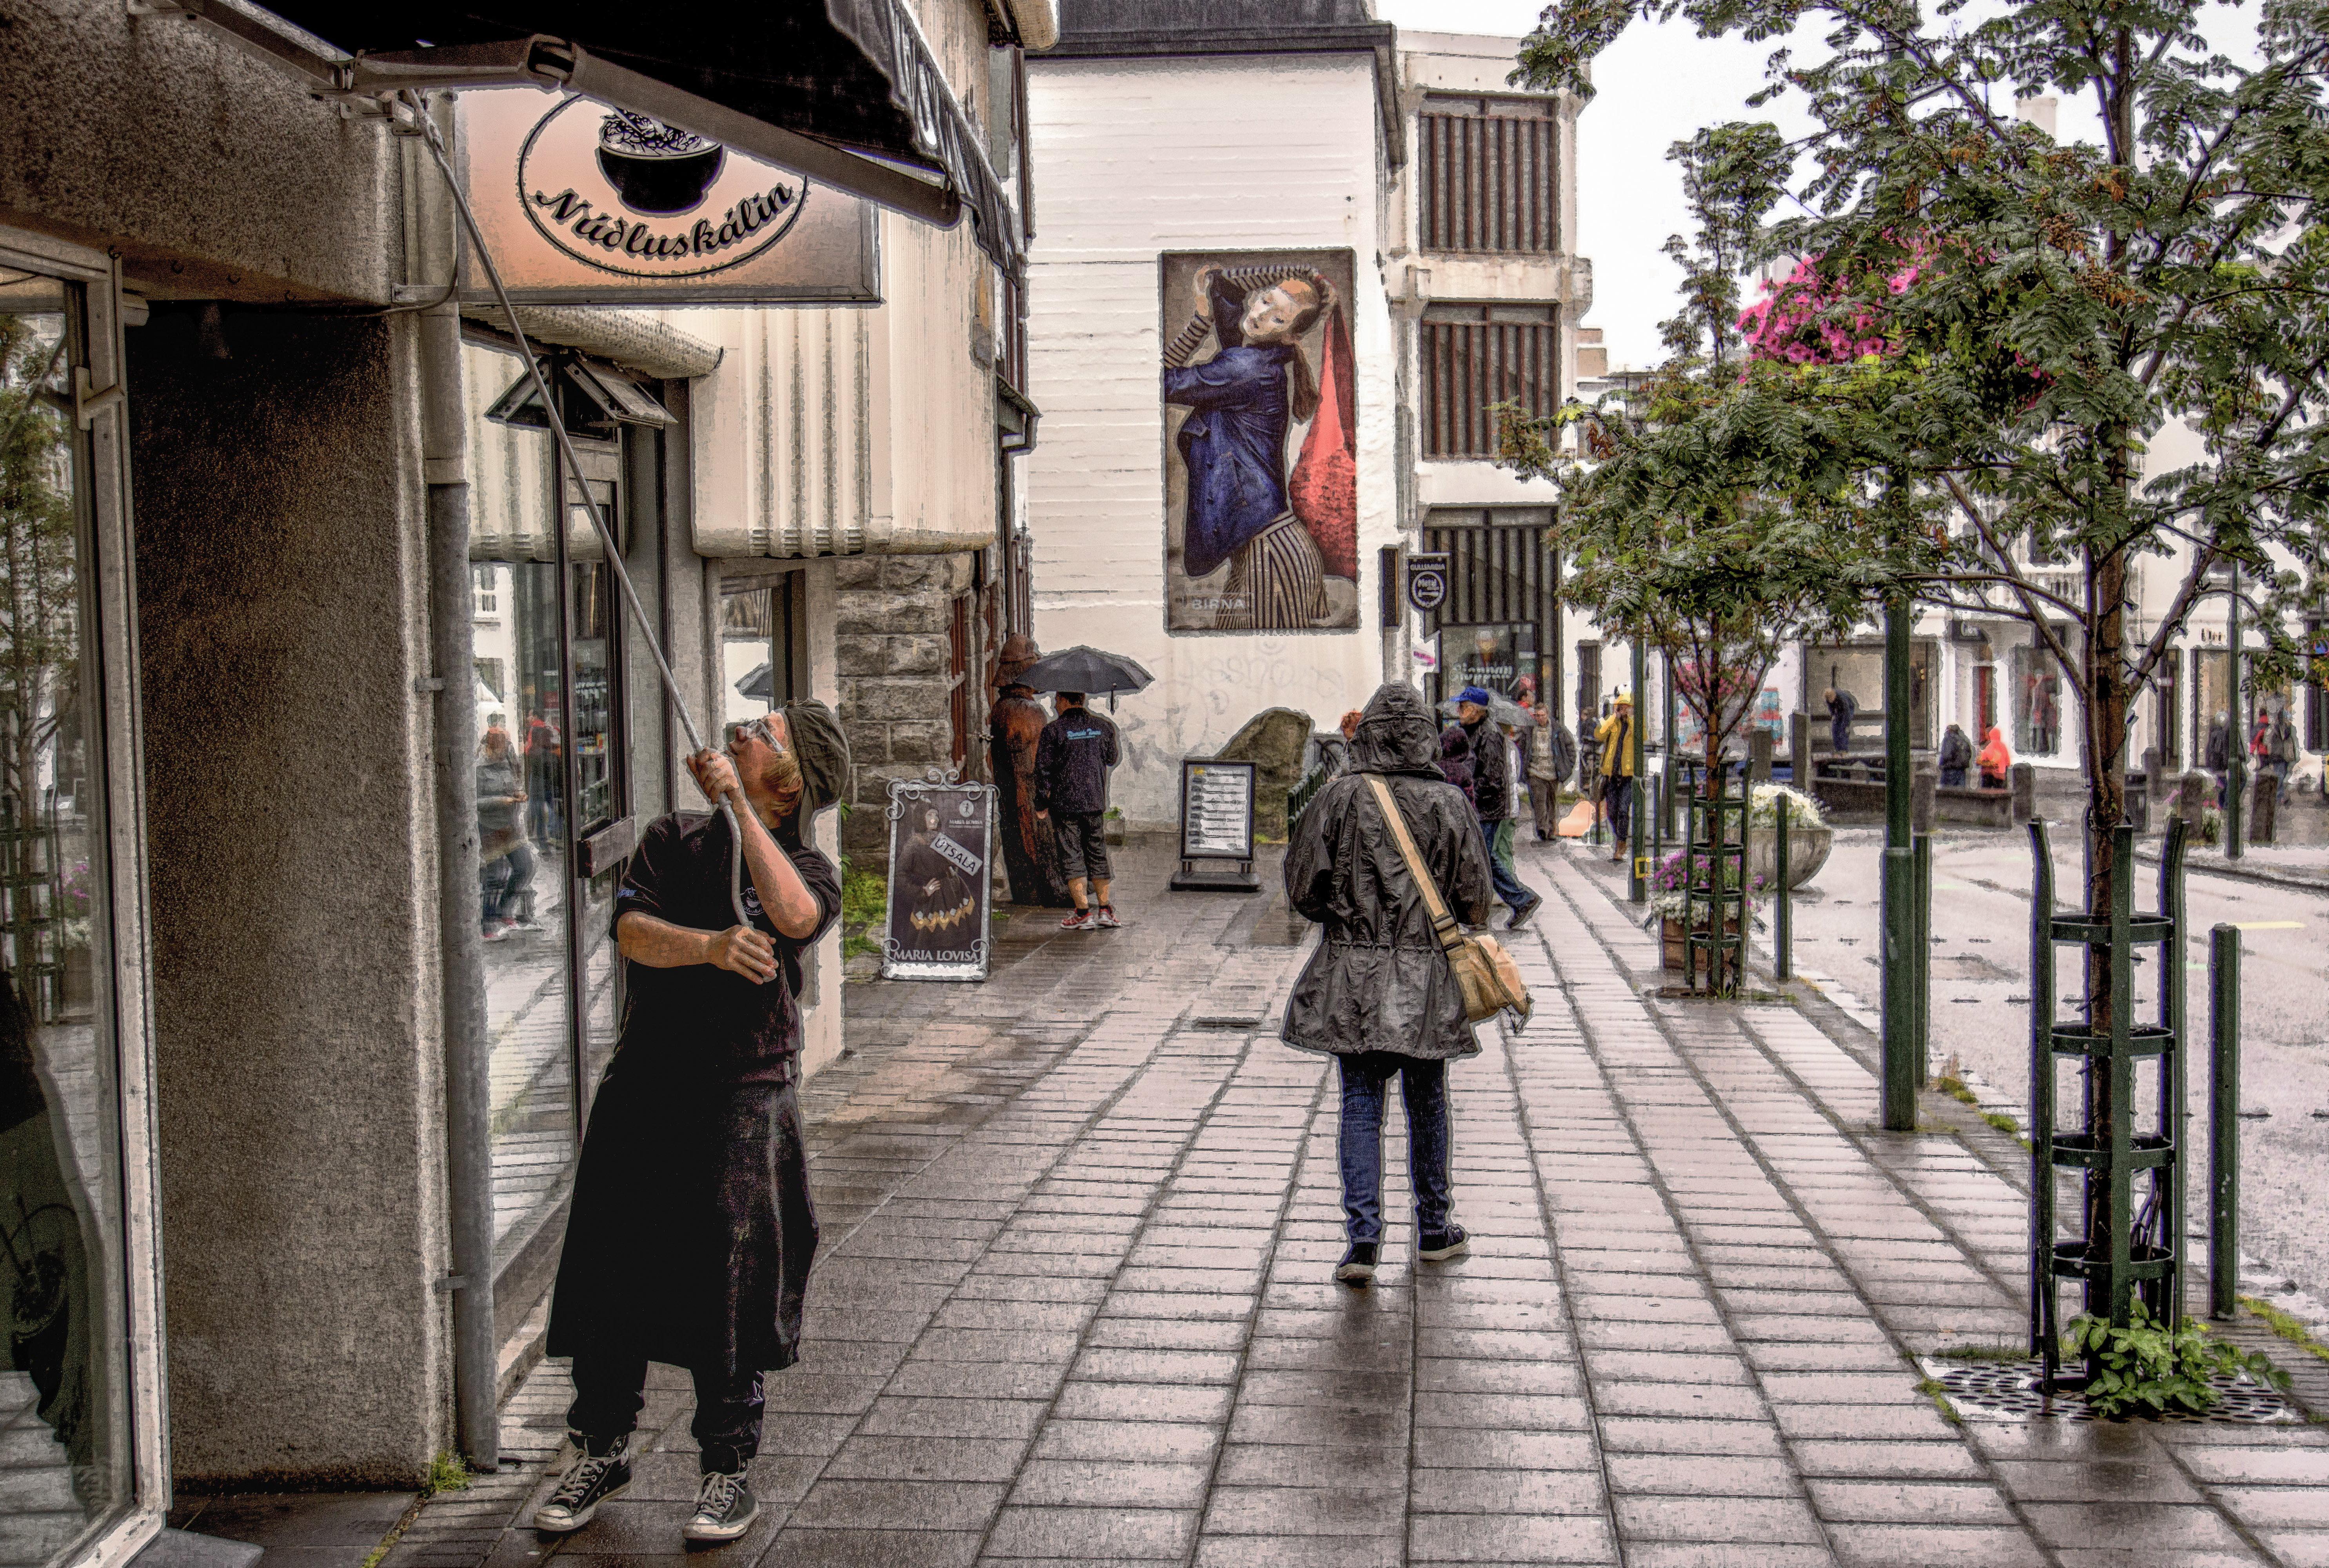 Iceland - Reykjavik Market Street 003-120